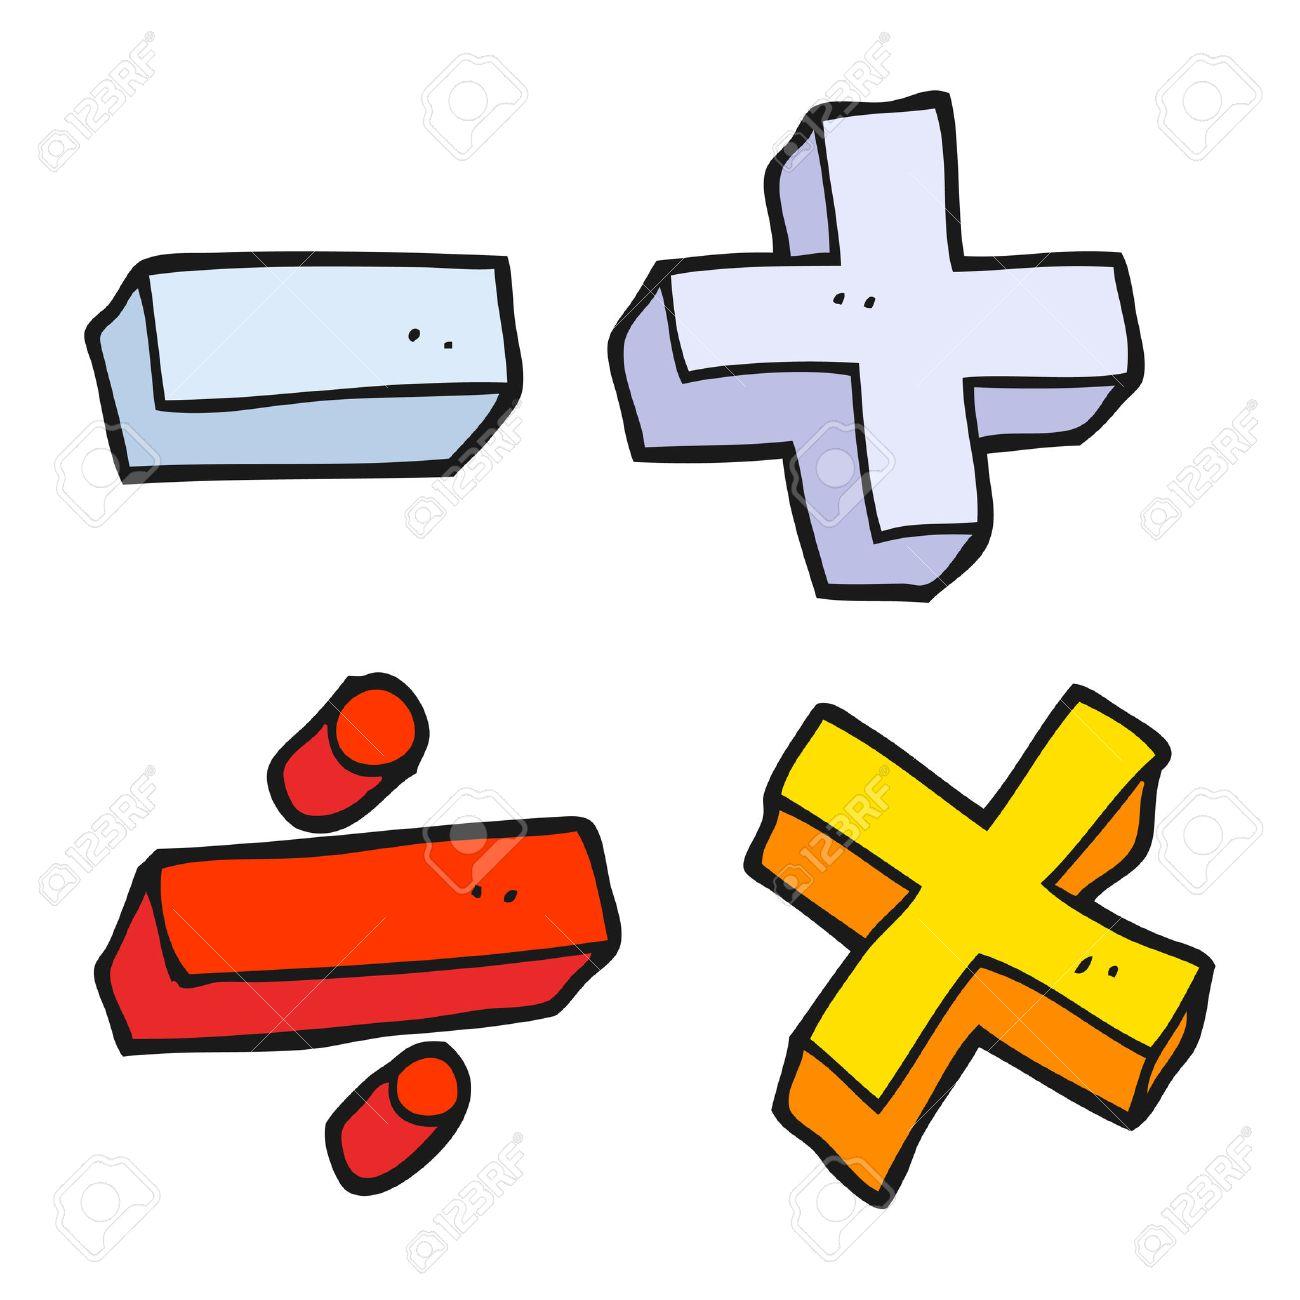 freehand drawn cartoon math symbols - 54020959